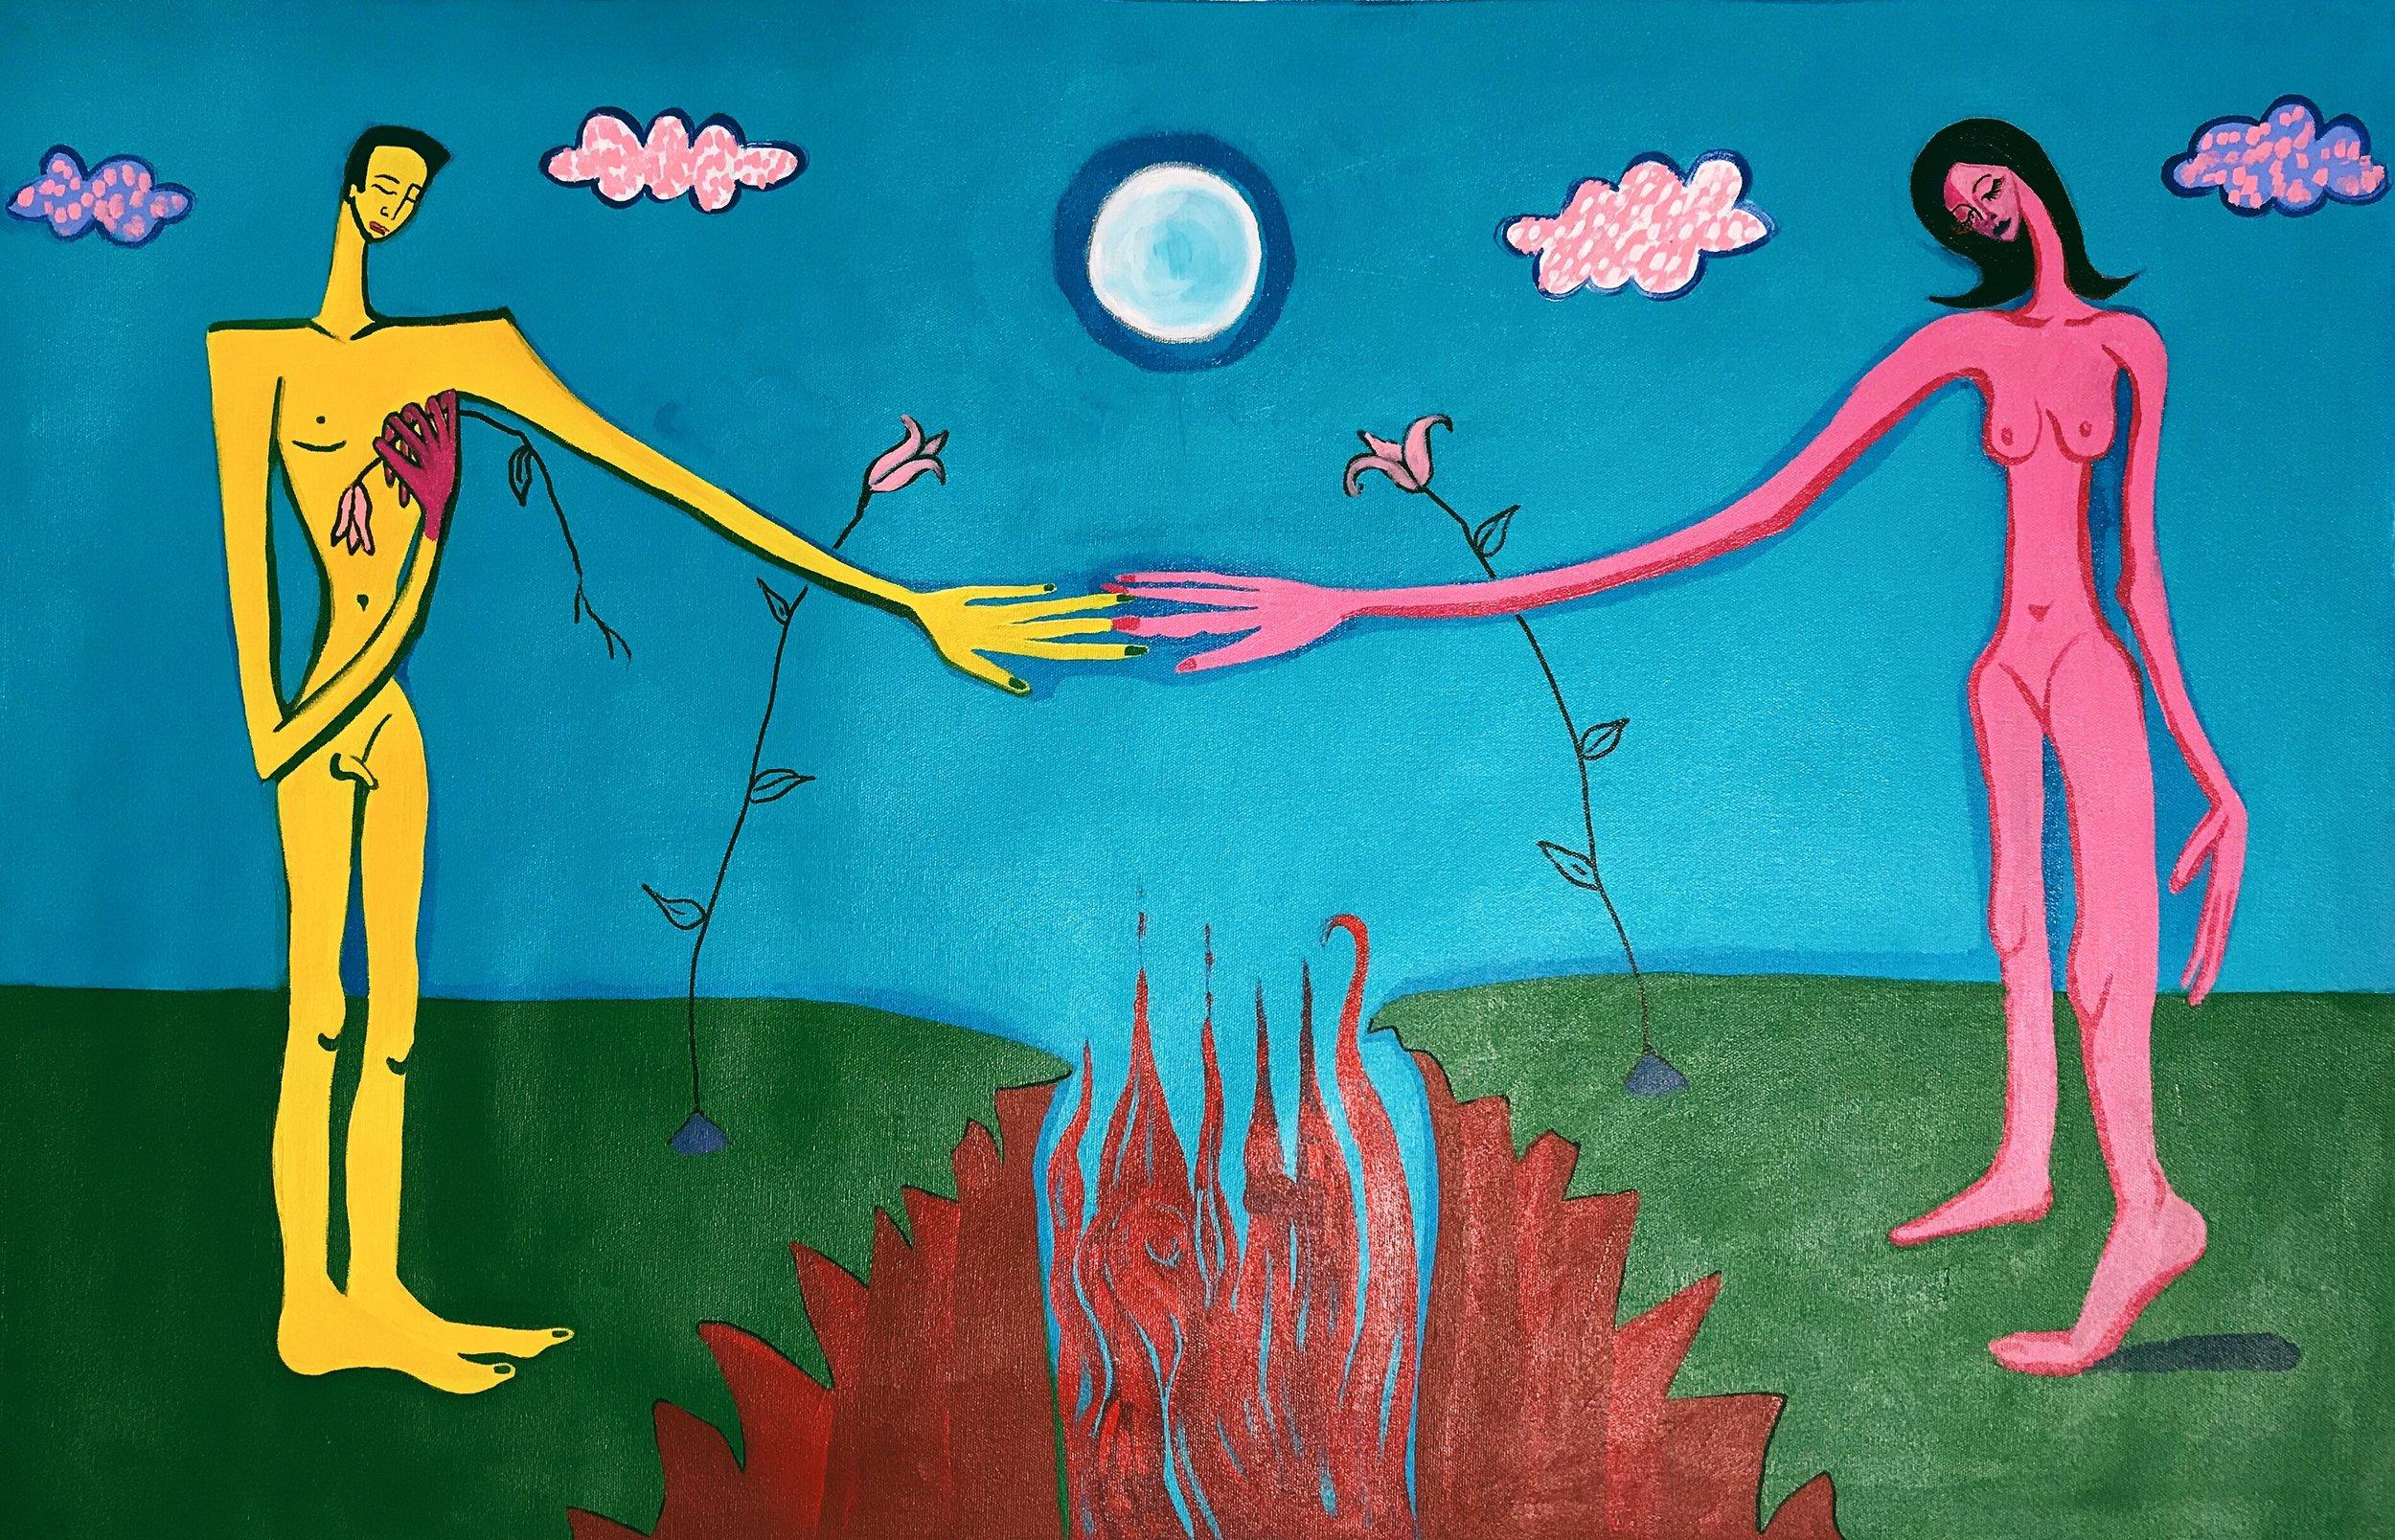 When the World Split in Half SOFIA ZU'BI Acrylic on canvas 22x 35x 1 in